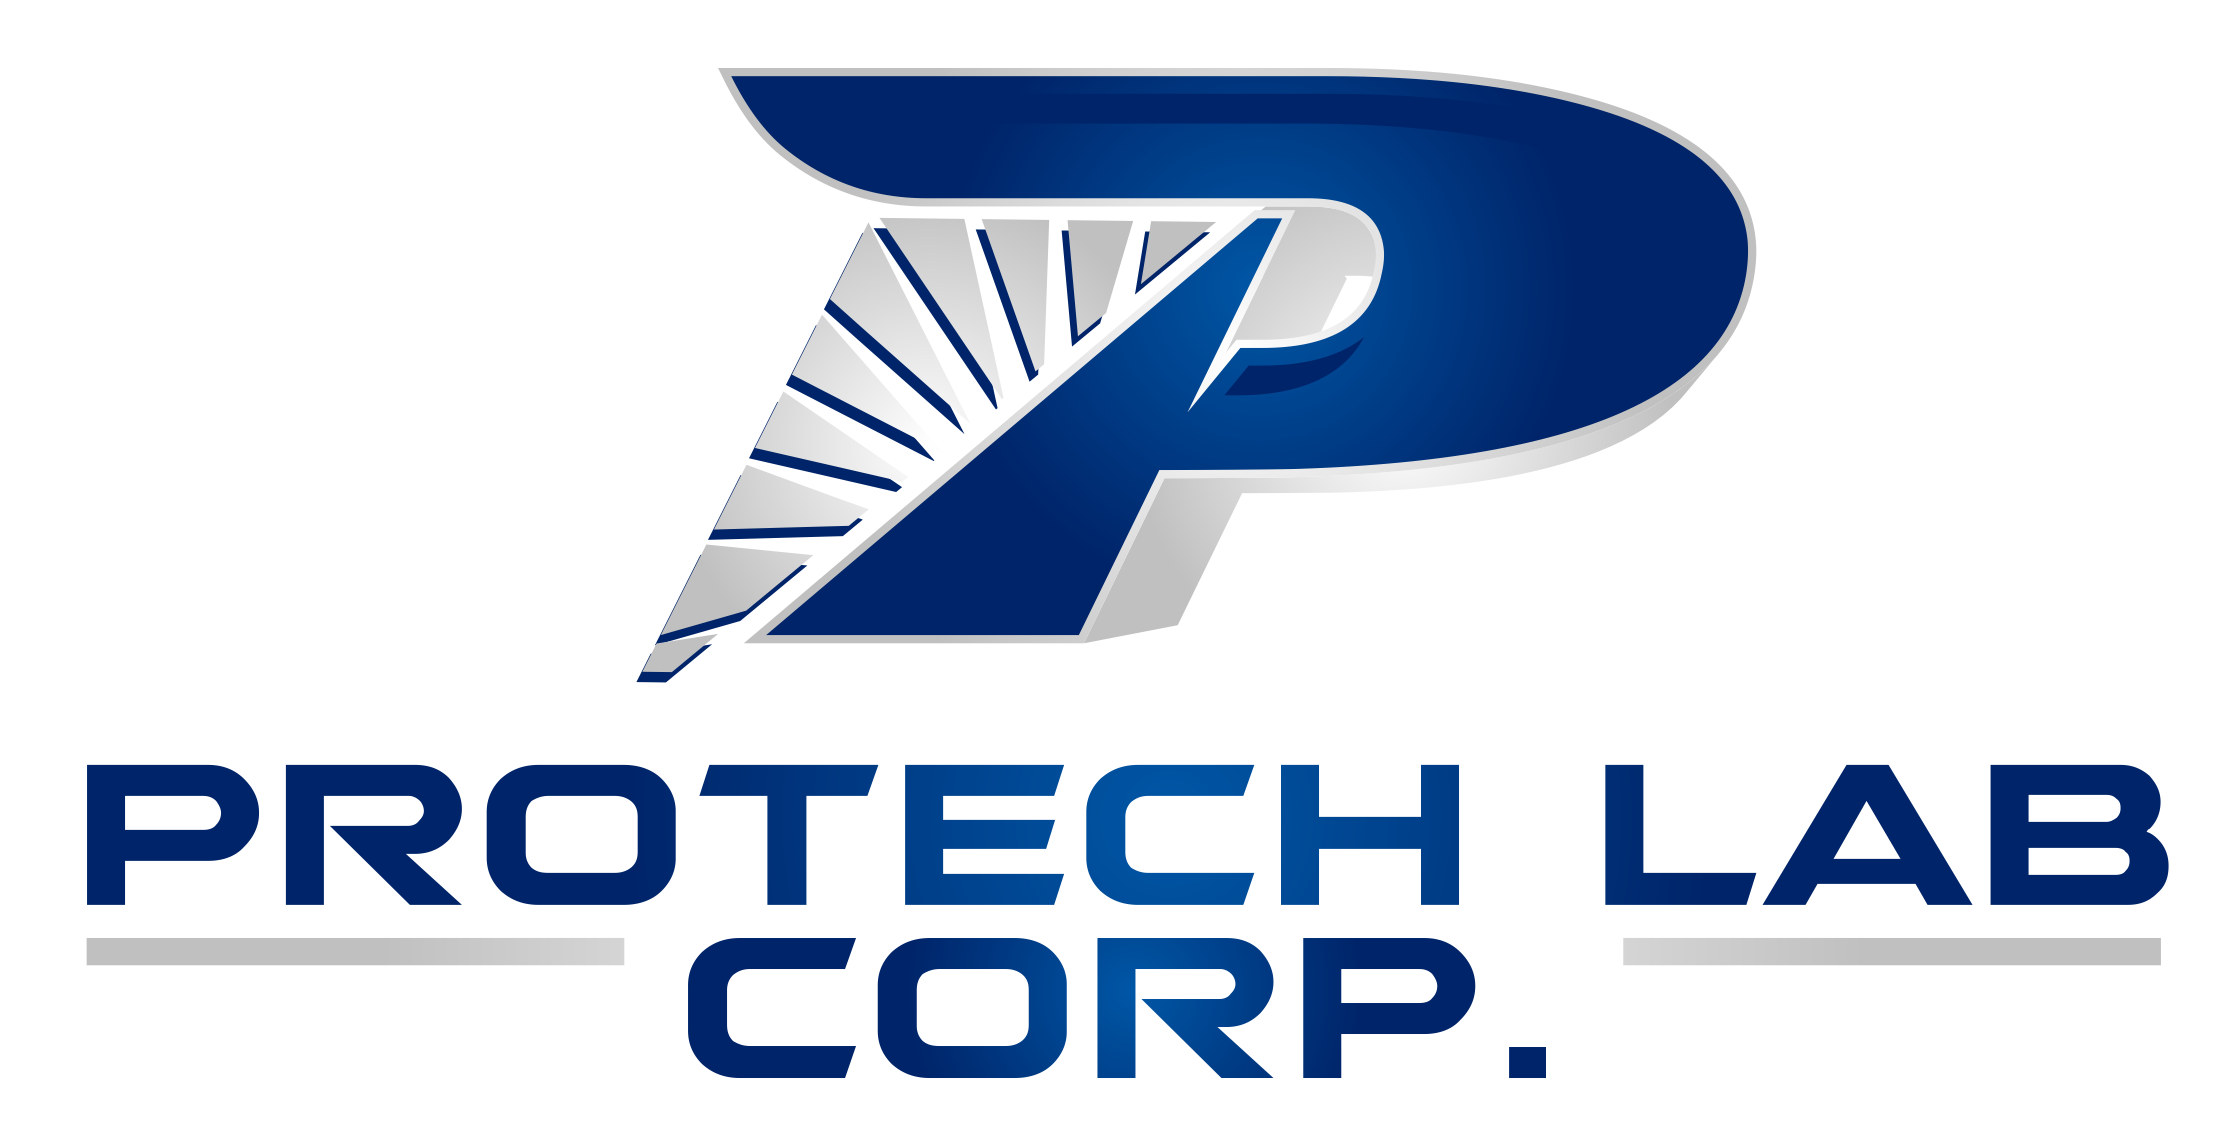 Protech Lab Corp